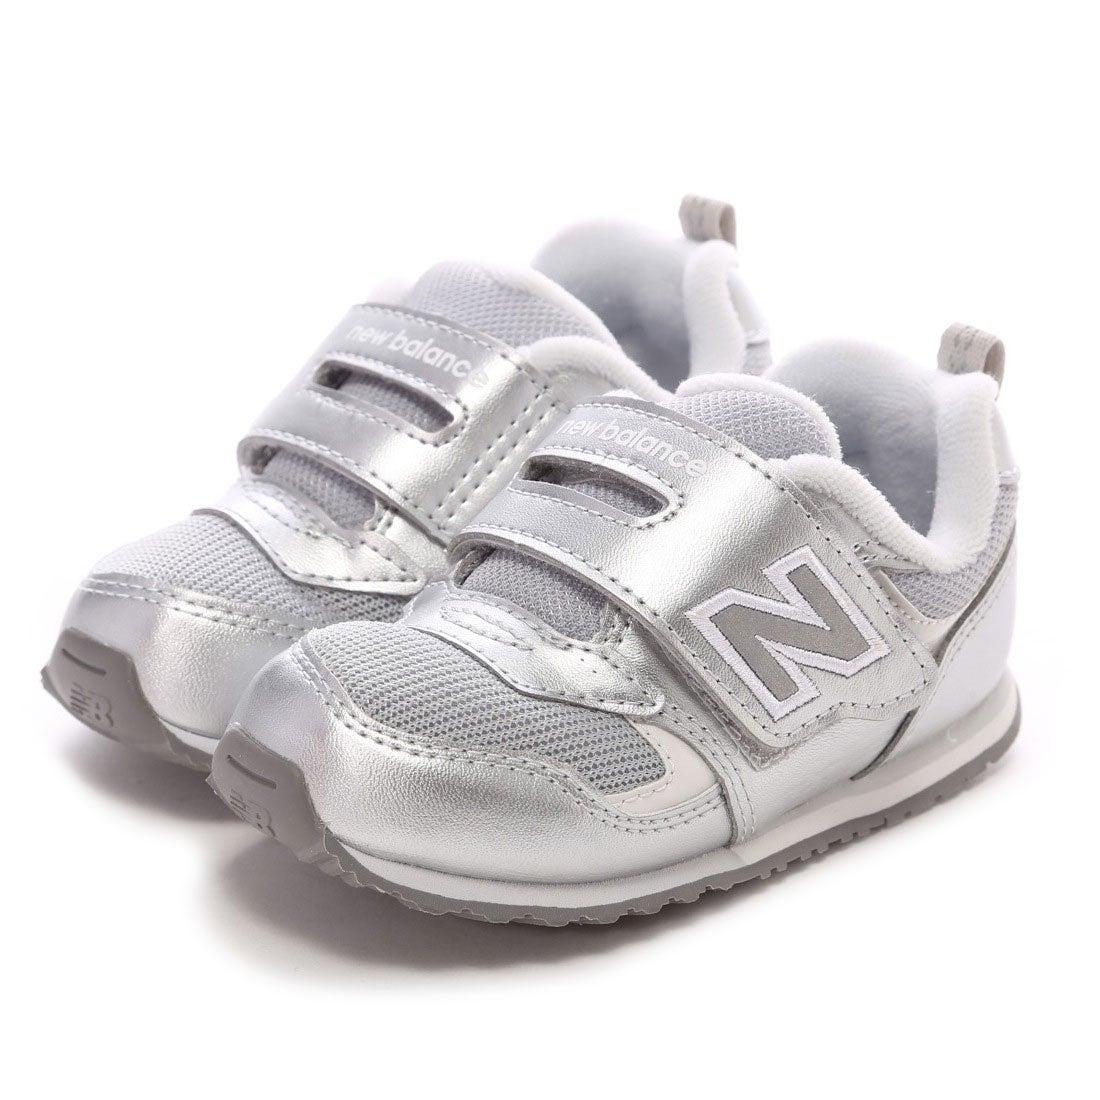 f22bde3aec152 ニューバランス new balance NB FS312 SVI(シルバー) -靴&ファッション通販 ロコンド〜自宅で試着、気軽に返品